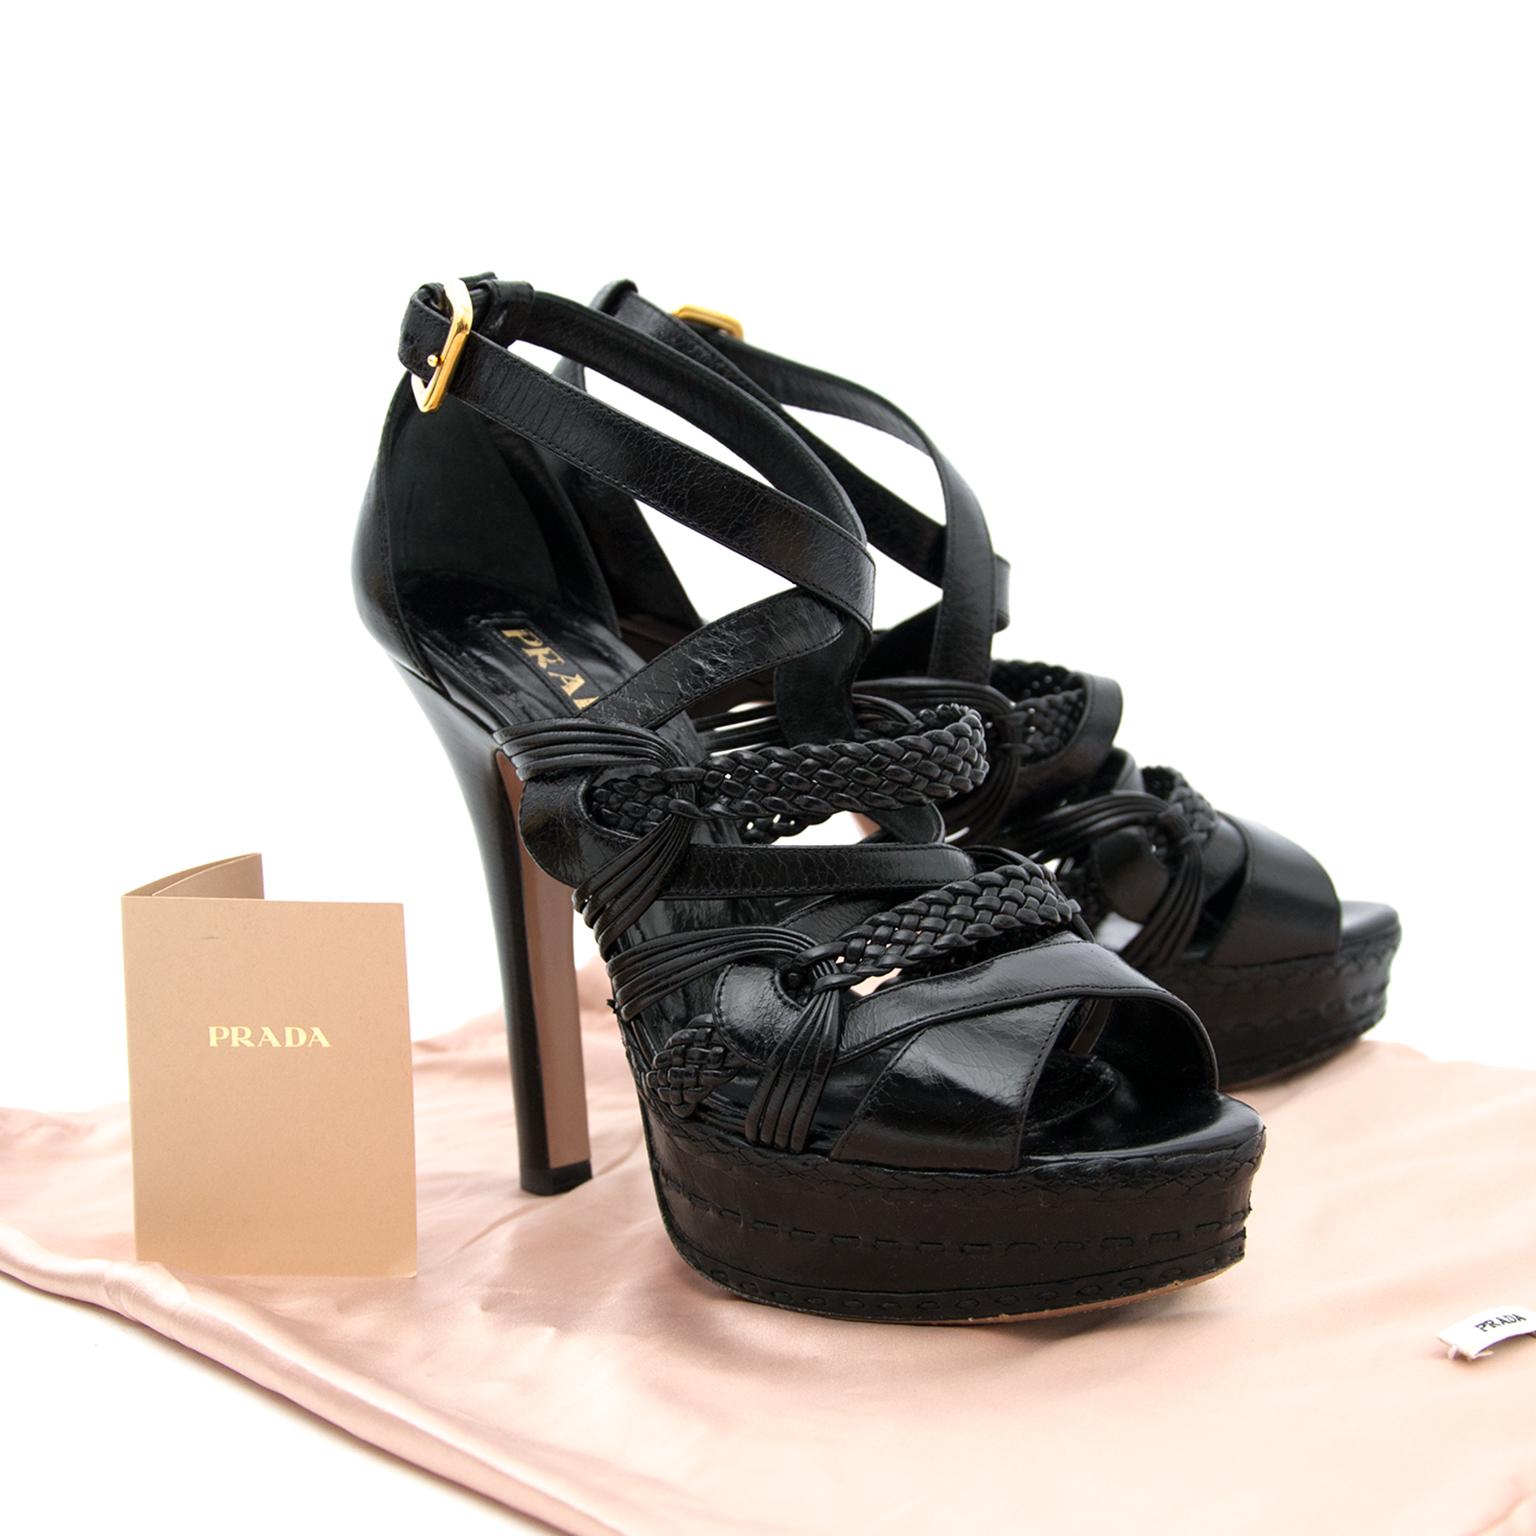 Achetez Prada Black Heels en ligne chez Labellov.com